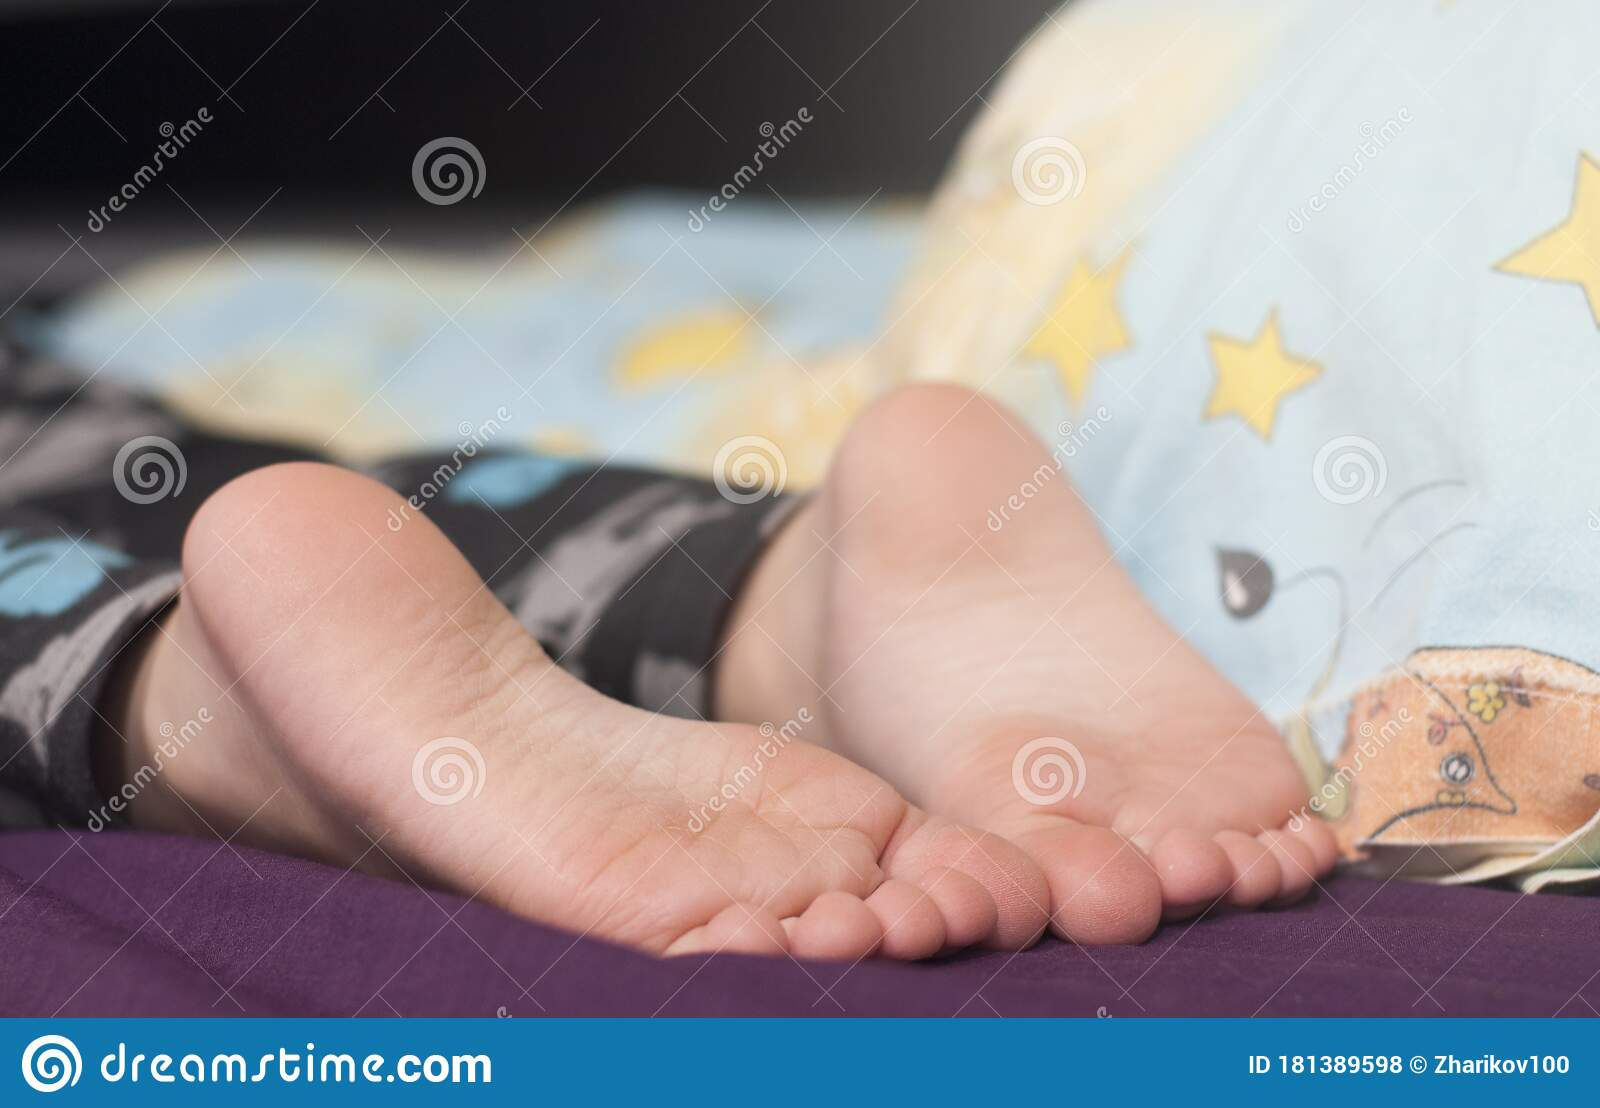 Sleeping womans feet stock image. Image of close